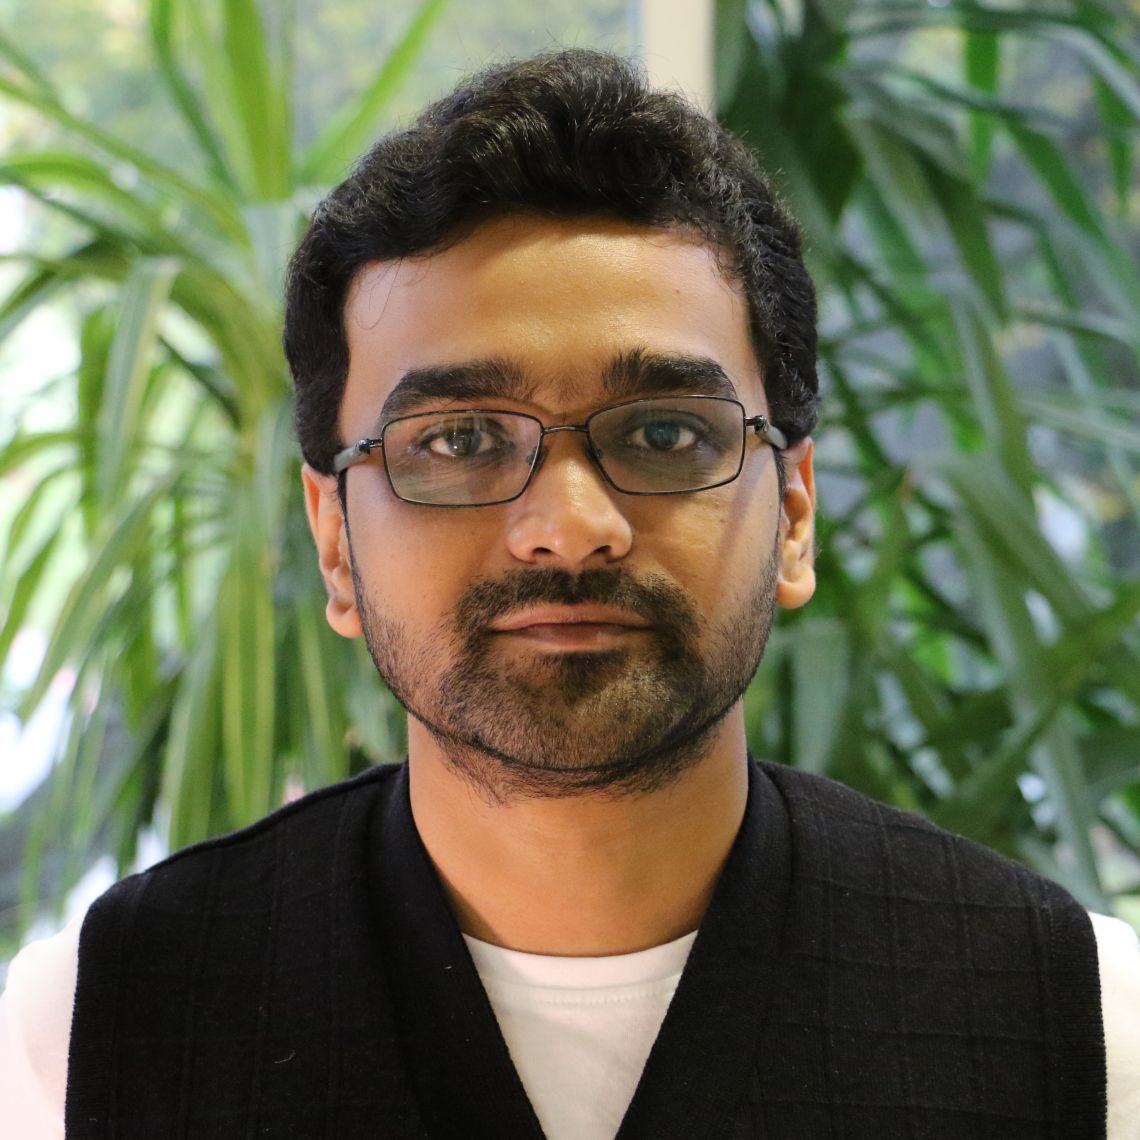 Mohd Anisul Karim